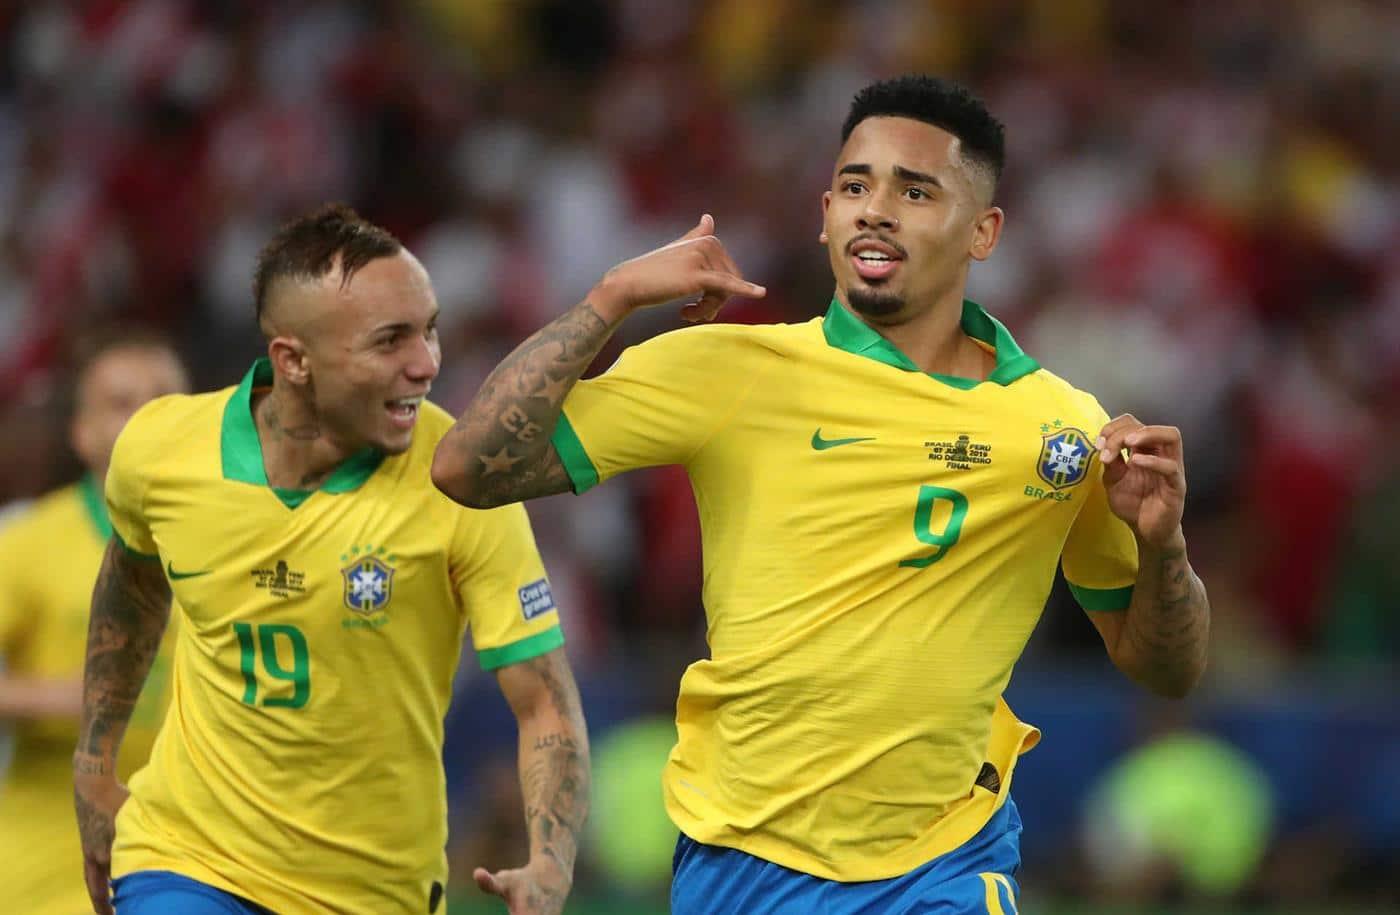 brasil conquista a copa américa - BRASIL - Brasil conquista a Copa América